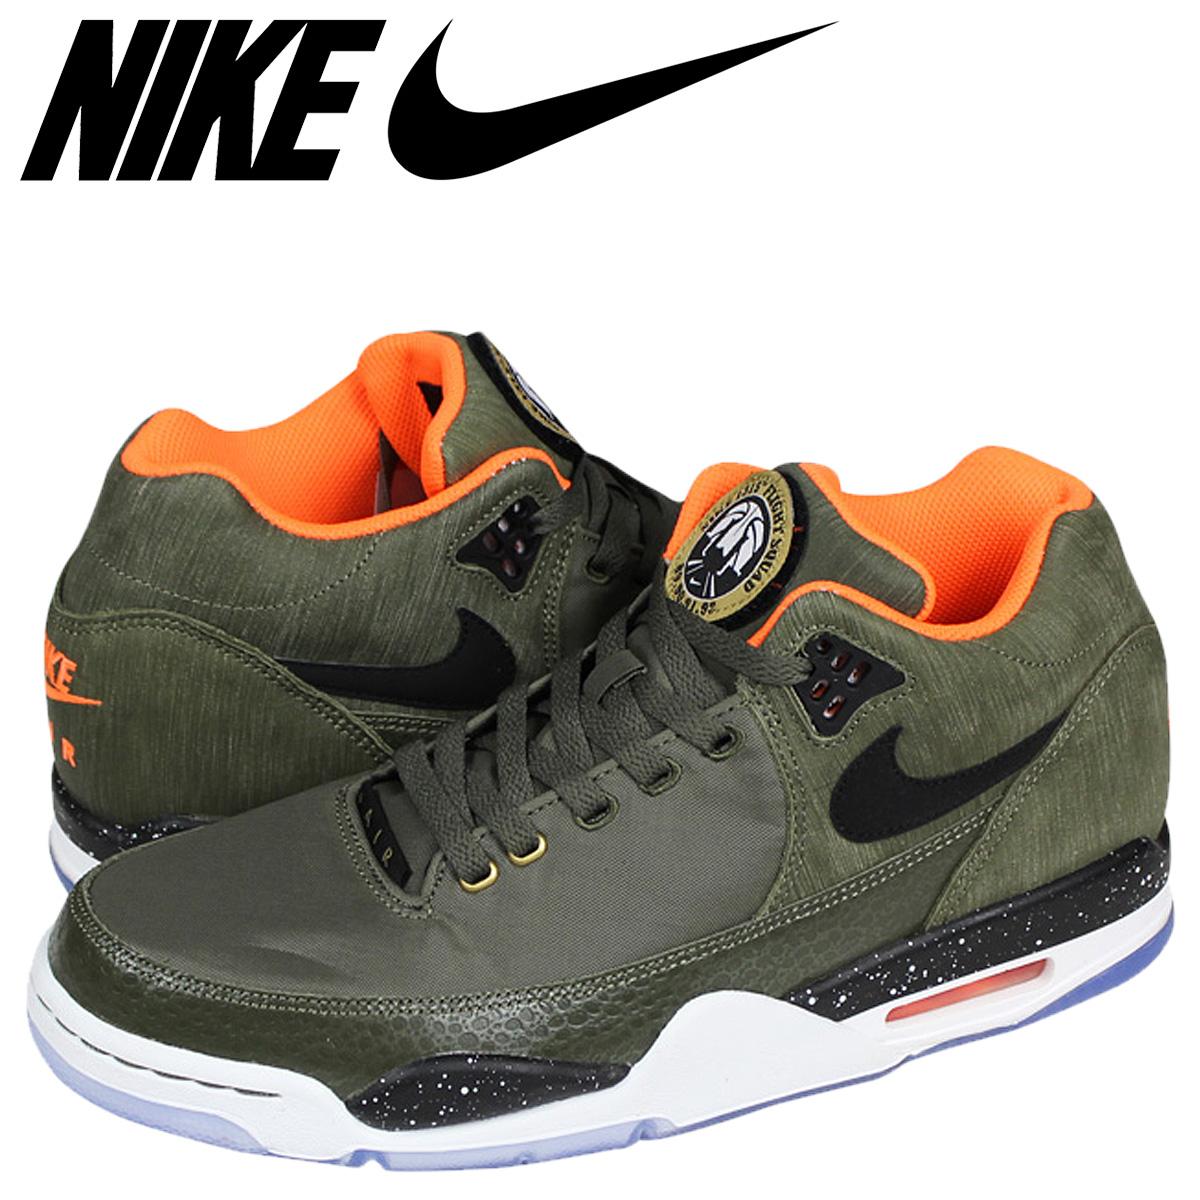 official photos 1febe 6c7f1 Nike NIKE flights quad sneakers FLIGHT SQUAD PREMIUM QS 679,249-200 olive  men ...